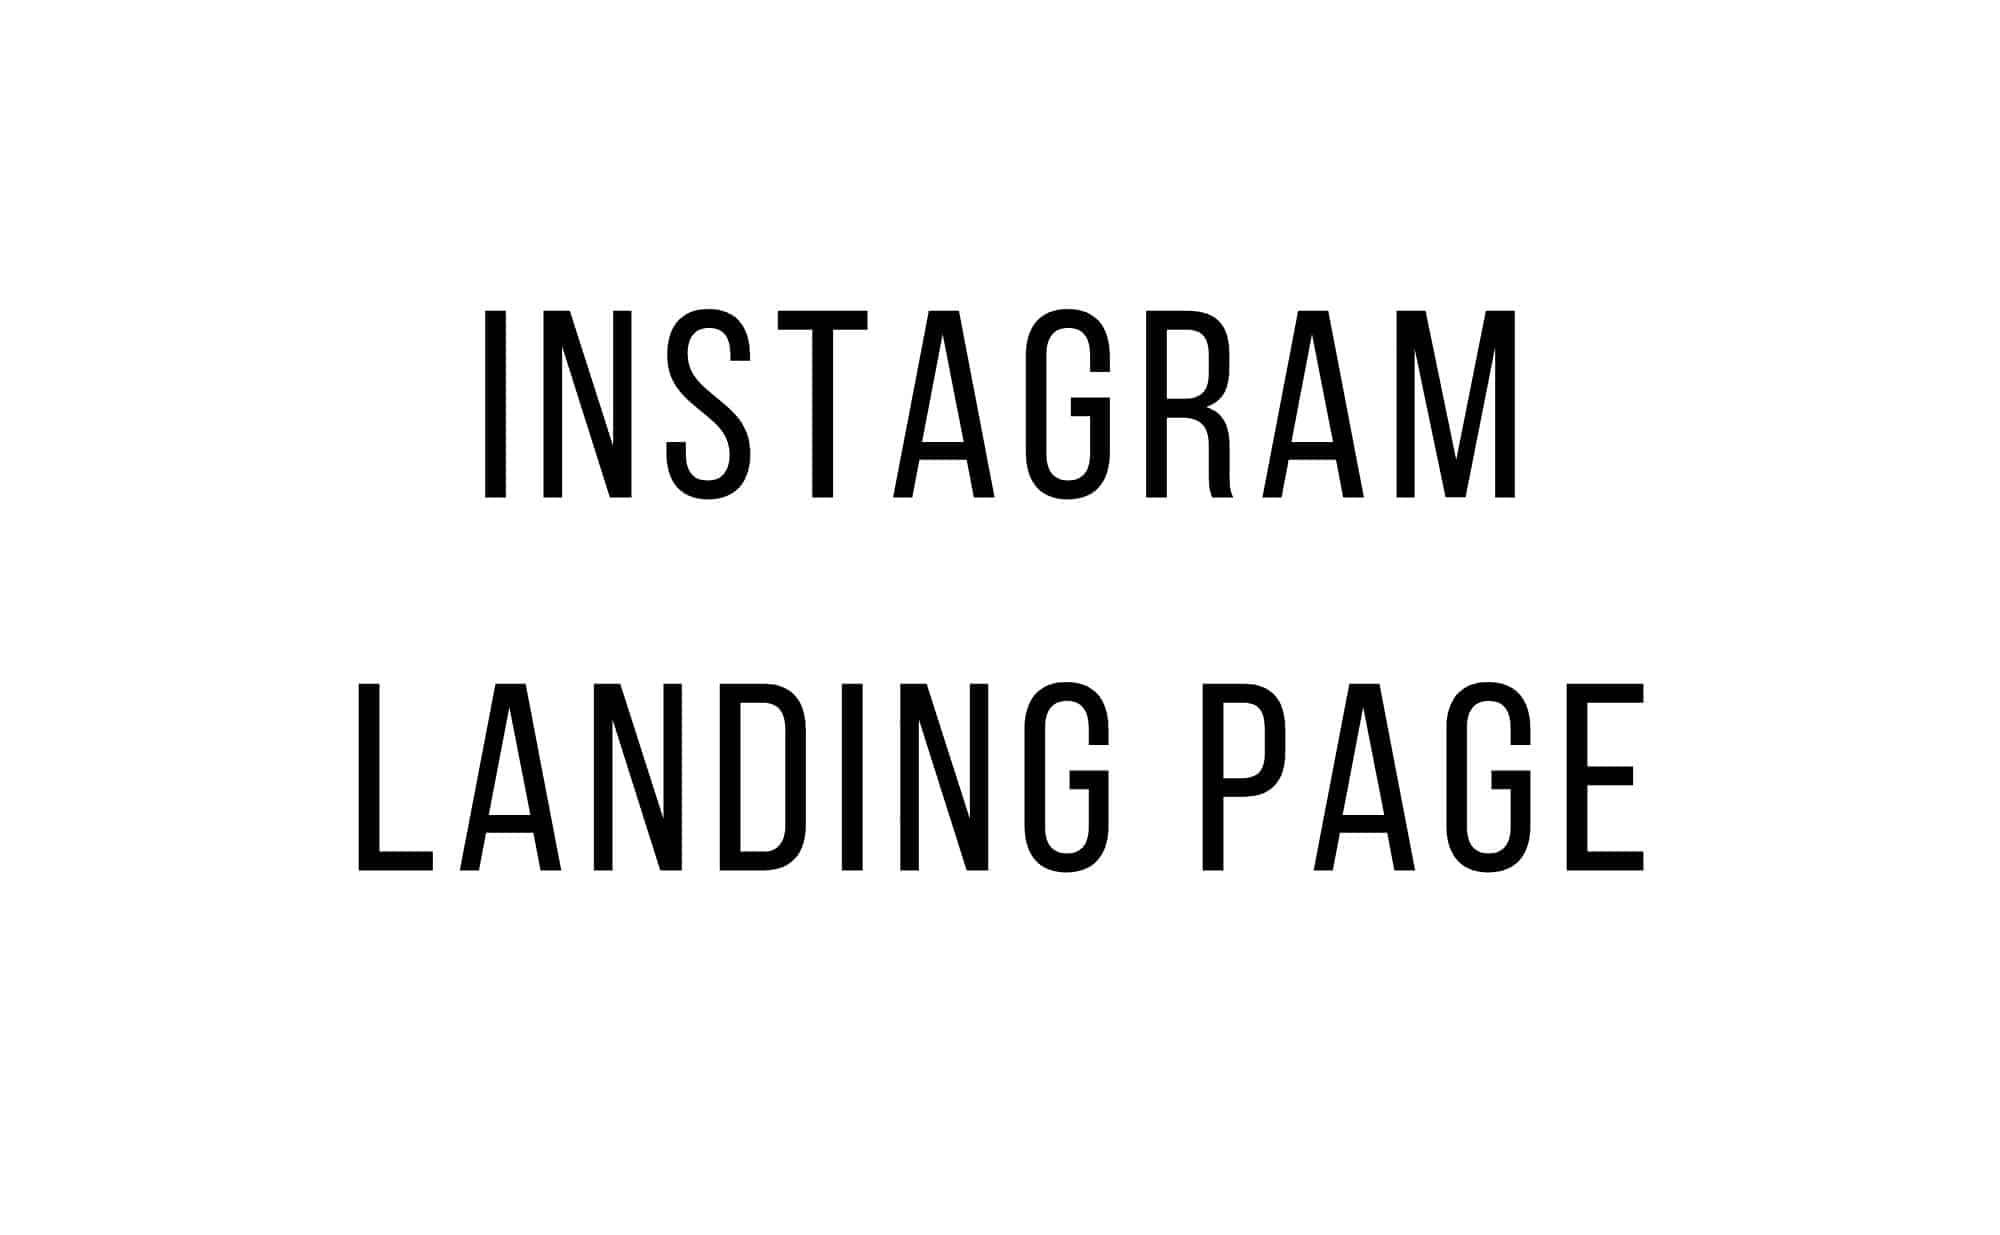 instagram landing page creation service